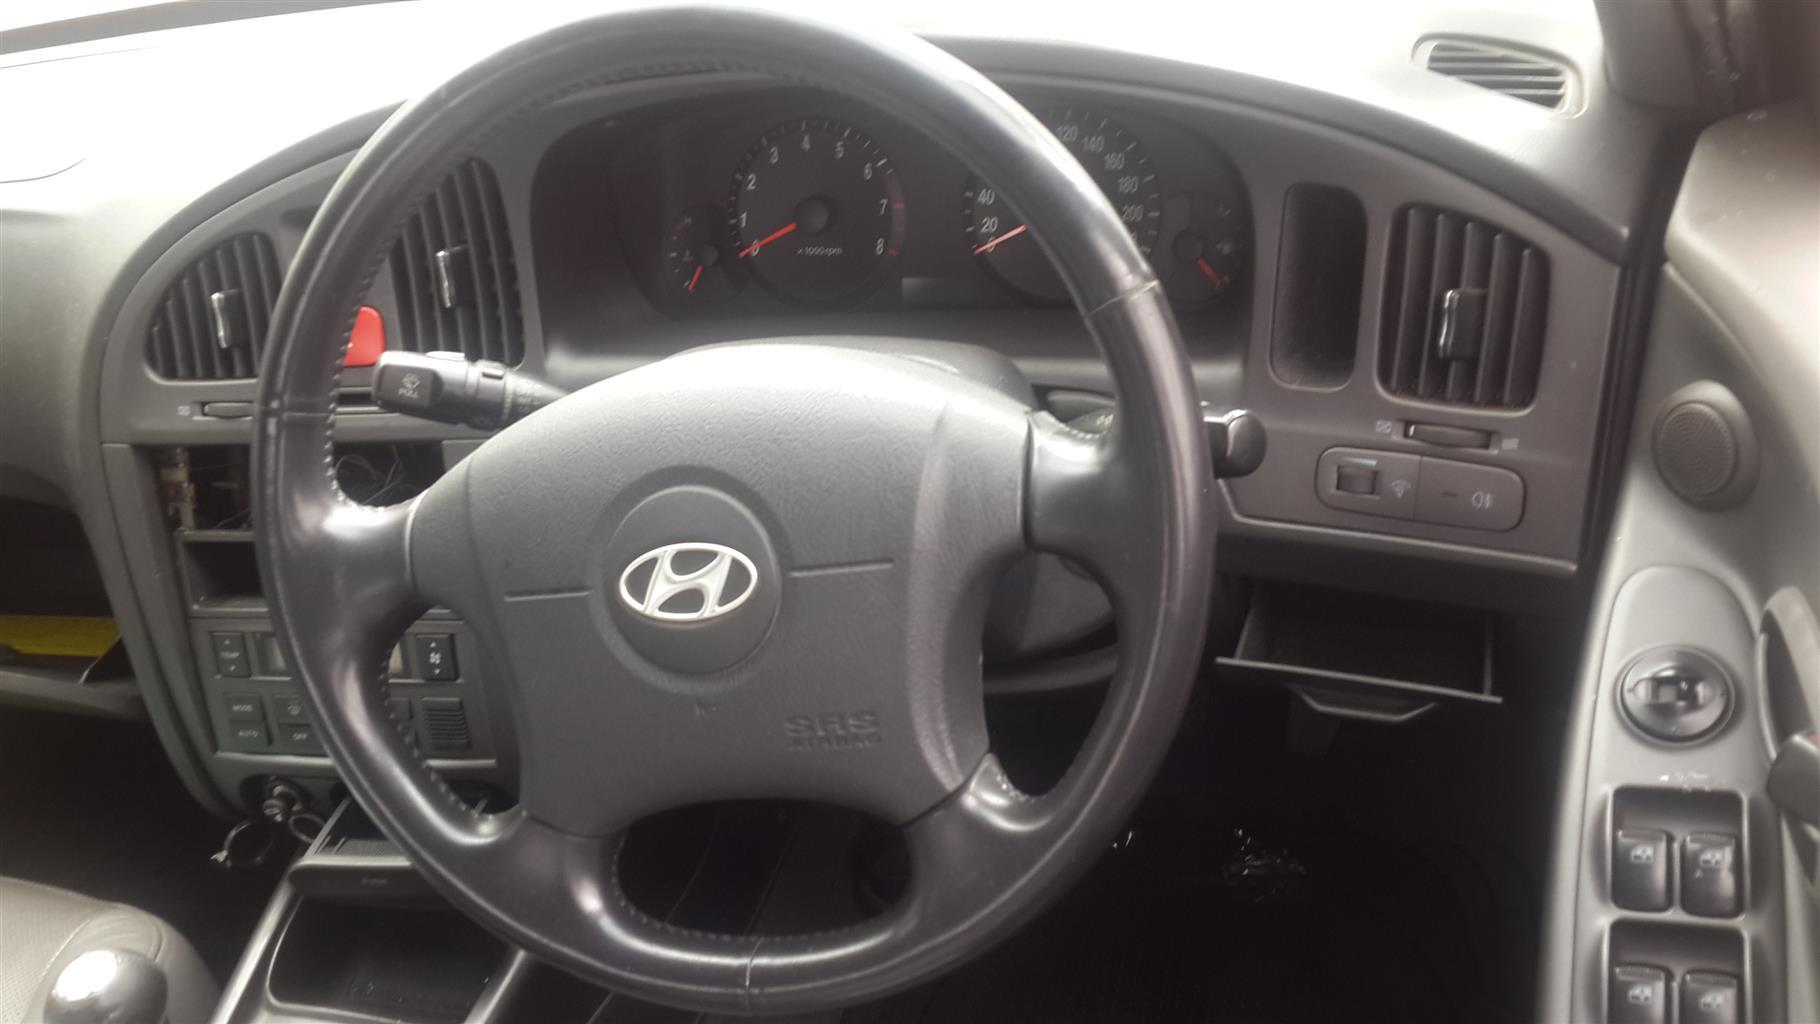 Hyundai Elantra J4 Spares Available